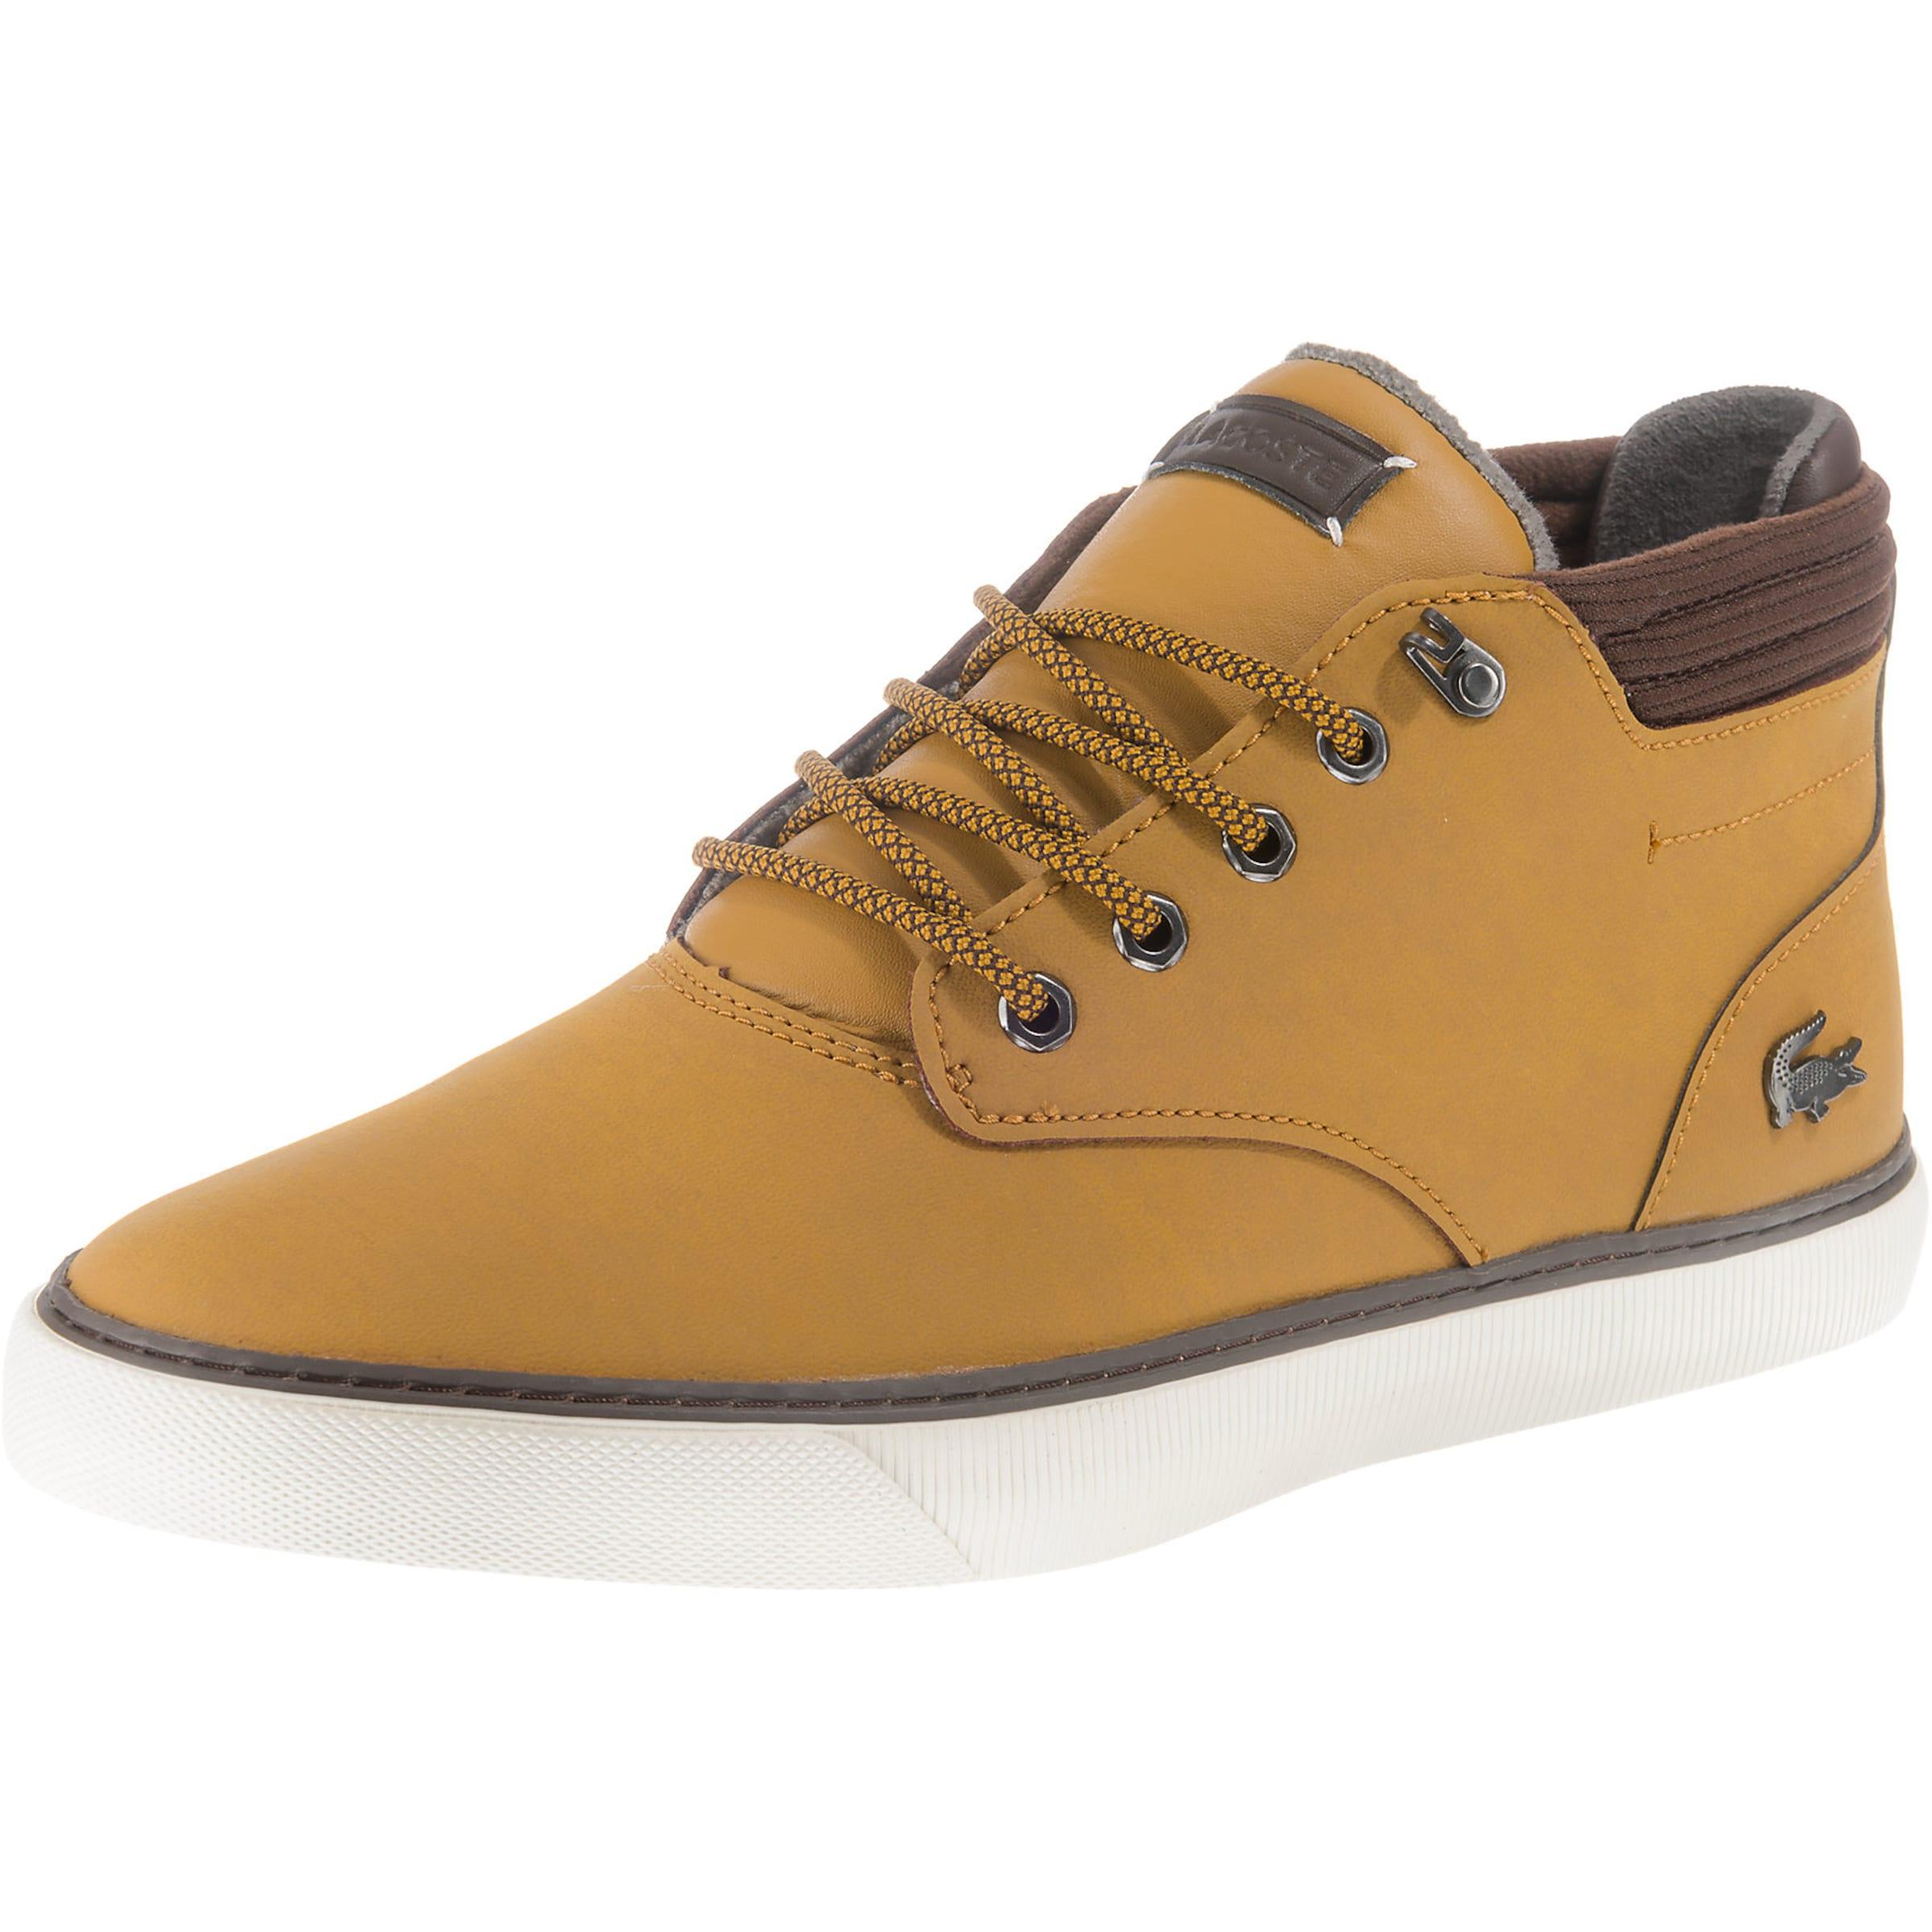 LACOSTE Esparre Sneaker Verschleißfeste billige Schuhe